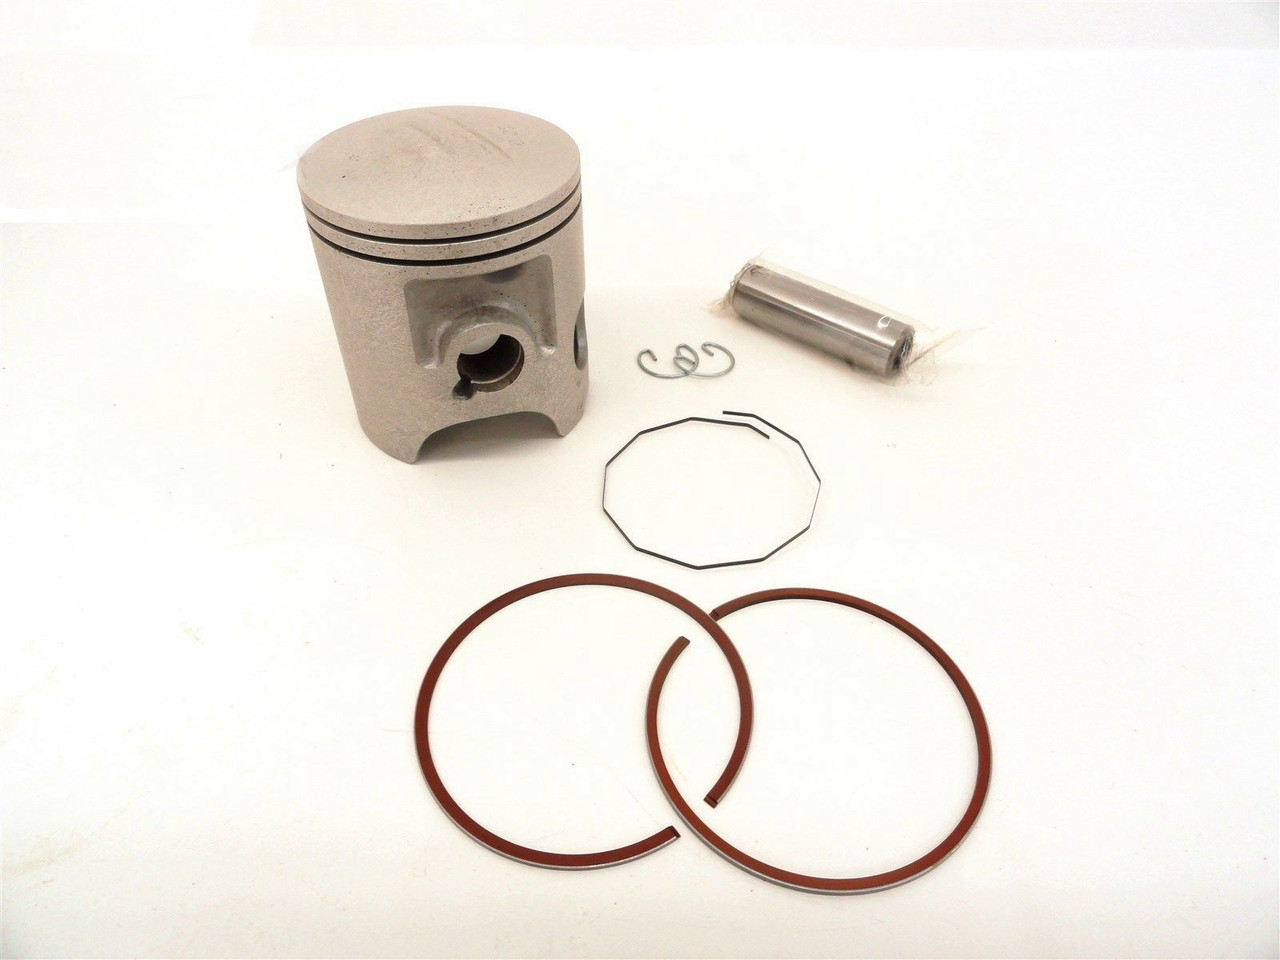 hight resolution of cylinder piston rings 25mm over bore 64 25mm yamaha 87 06 yfz 350 banshee cyclesrus net